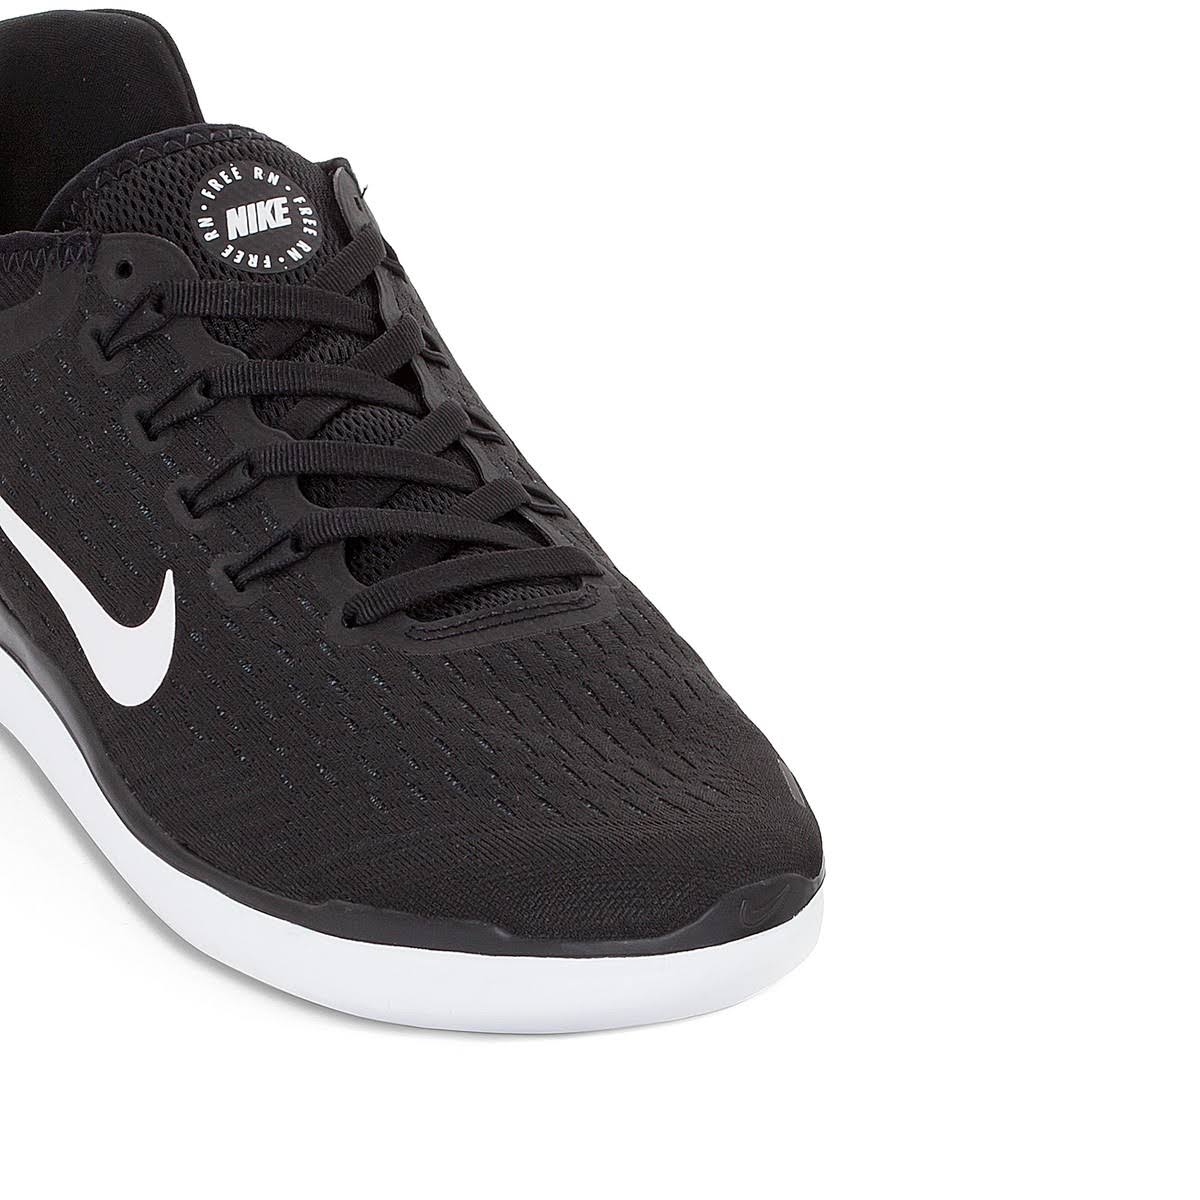 Free Nike Free Nerobianco Rn Nike 2018 PkXiOZu